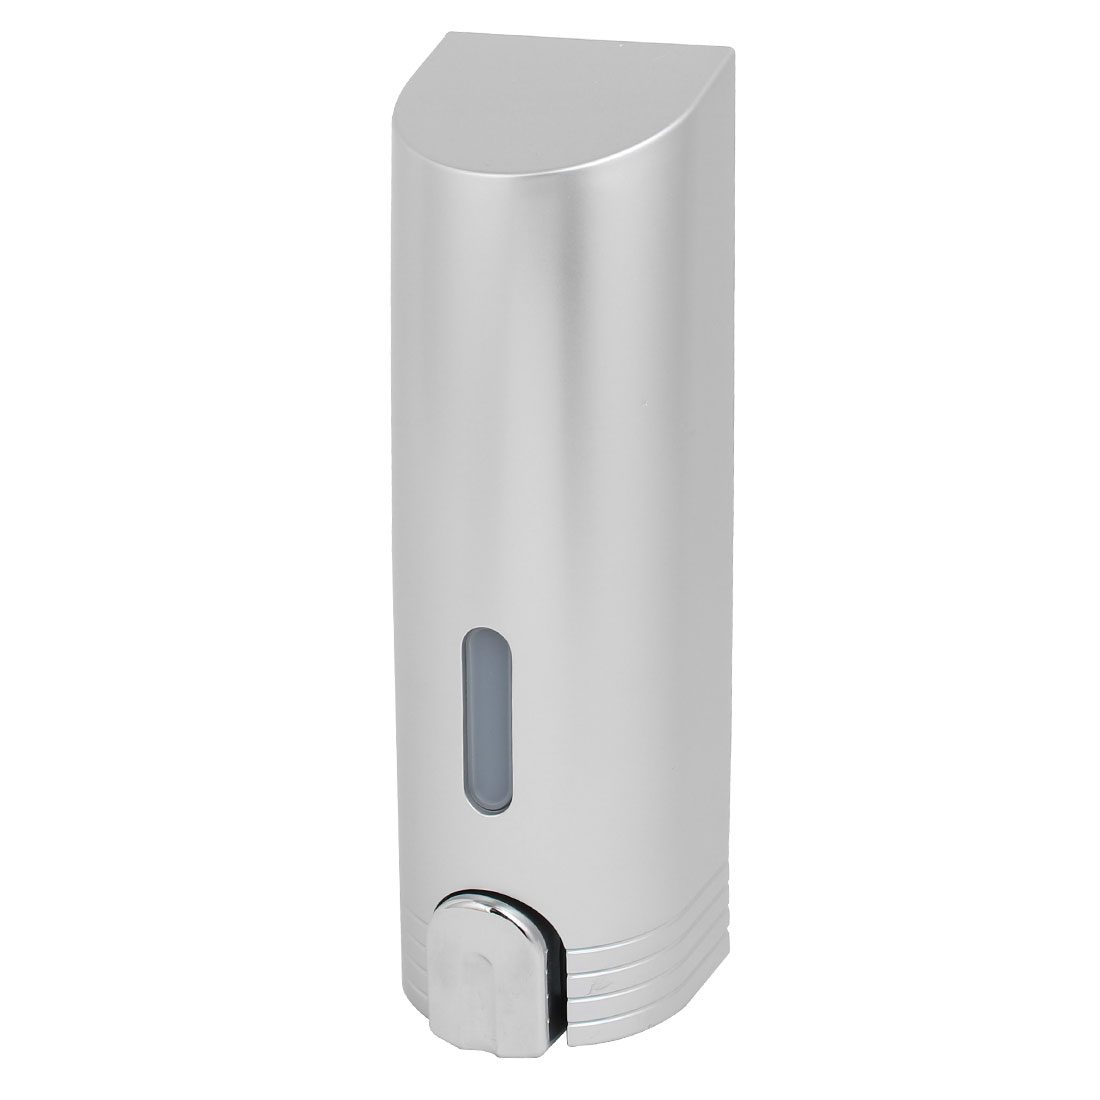 Unique Bargains 400ml ABS Plastic Gray Wall Mounted Bathroom Toilet Soap Lotion Pump Dispenser - image 4 de 4